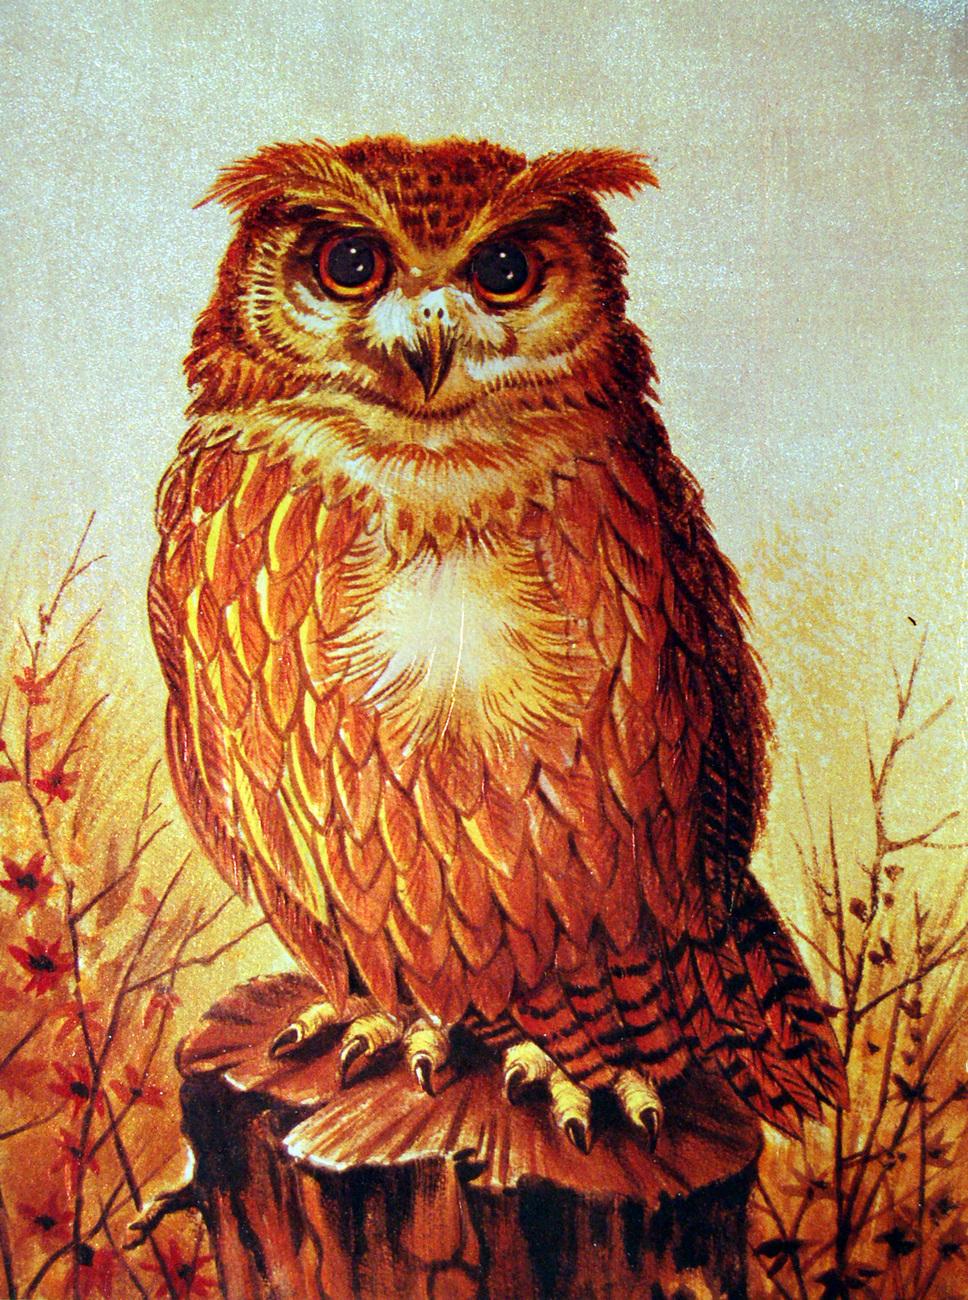 000000 large barn owl